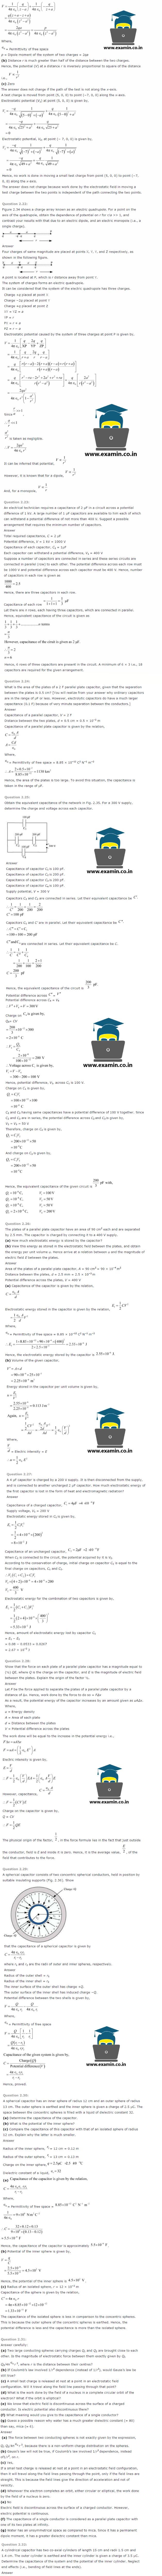 NCERT Solutions Class 12 Physics Chapter 2